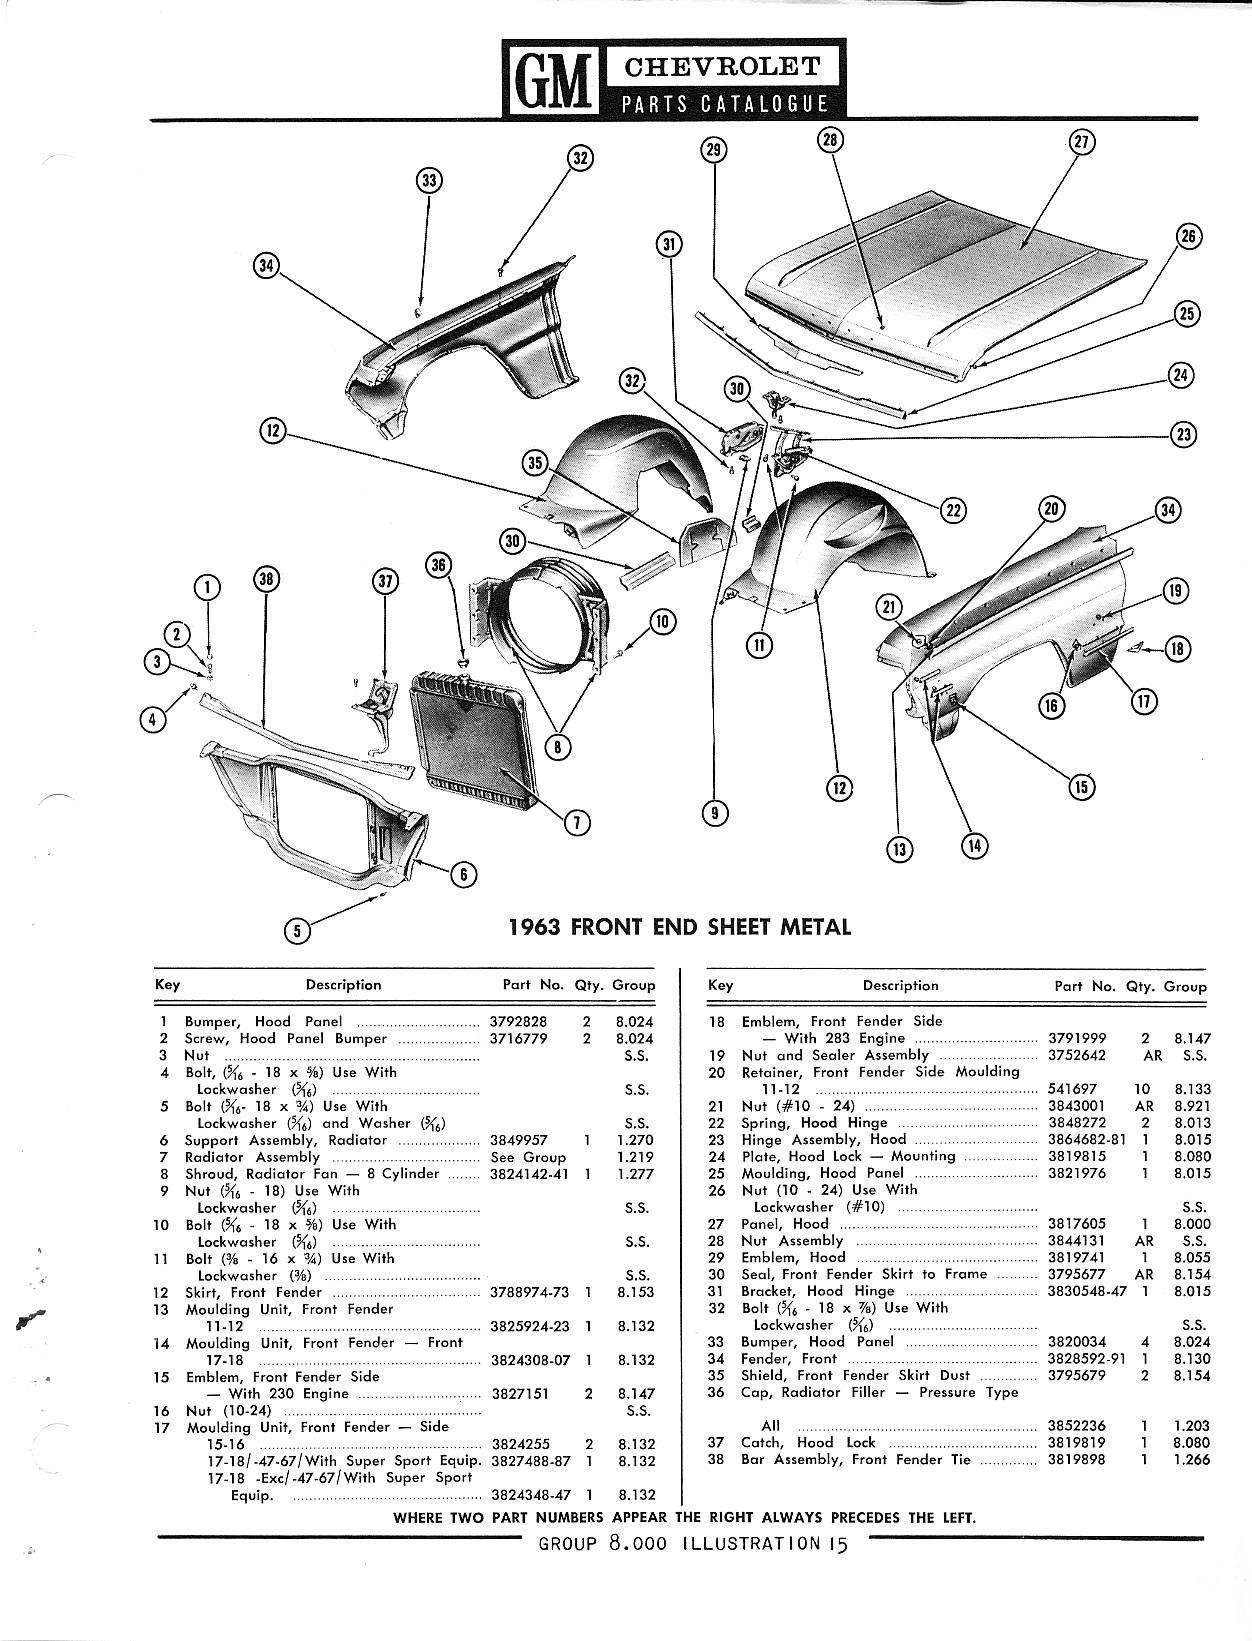 1958-1968 Chevrolet Parts Catalog / Image98.jpg